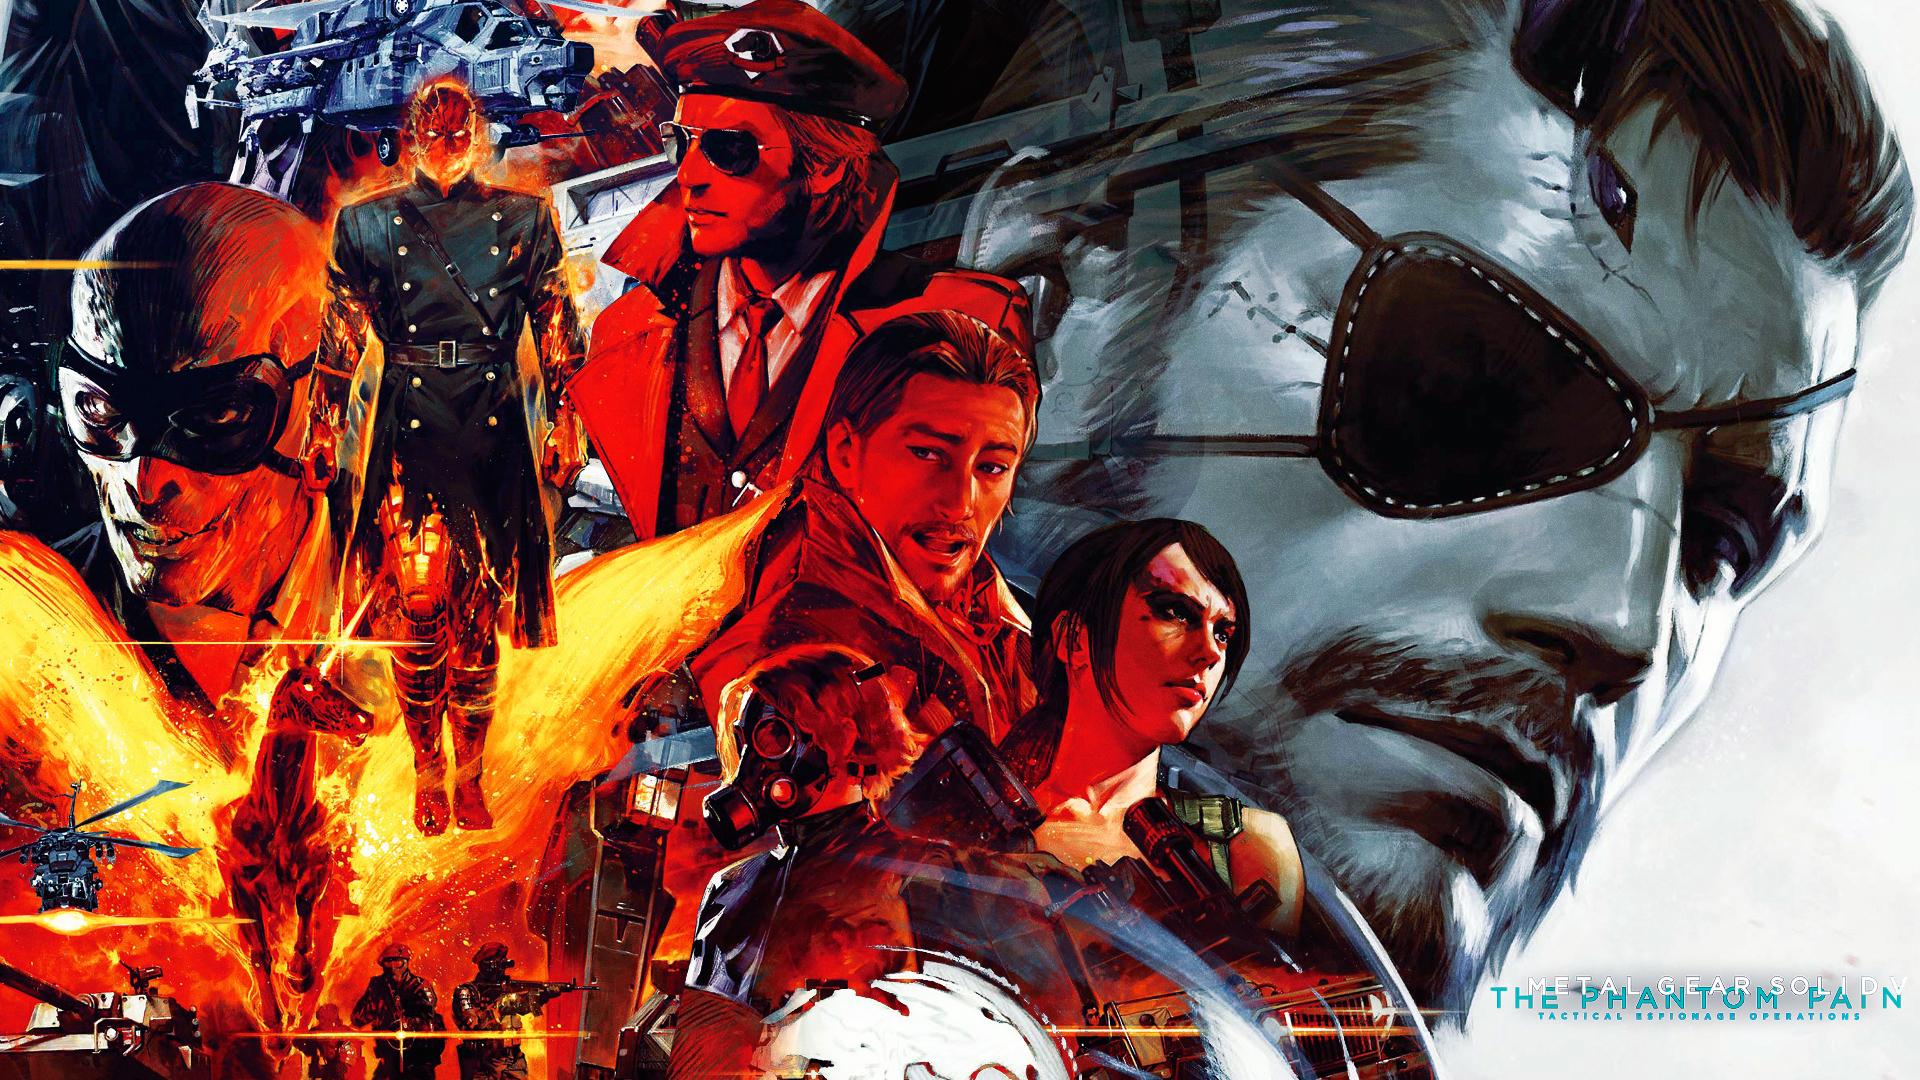 Metal Gear Solid V The Phantom Pain Characters Wallpaper Hd Games